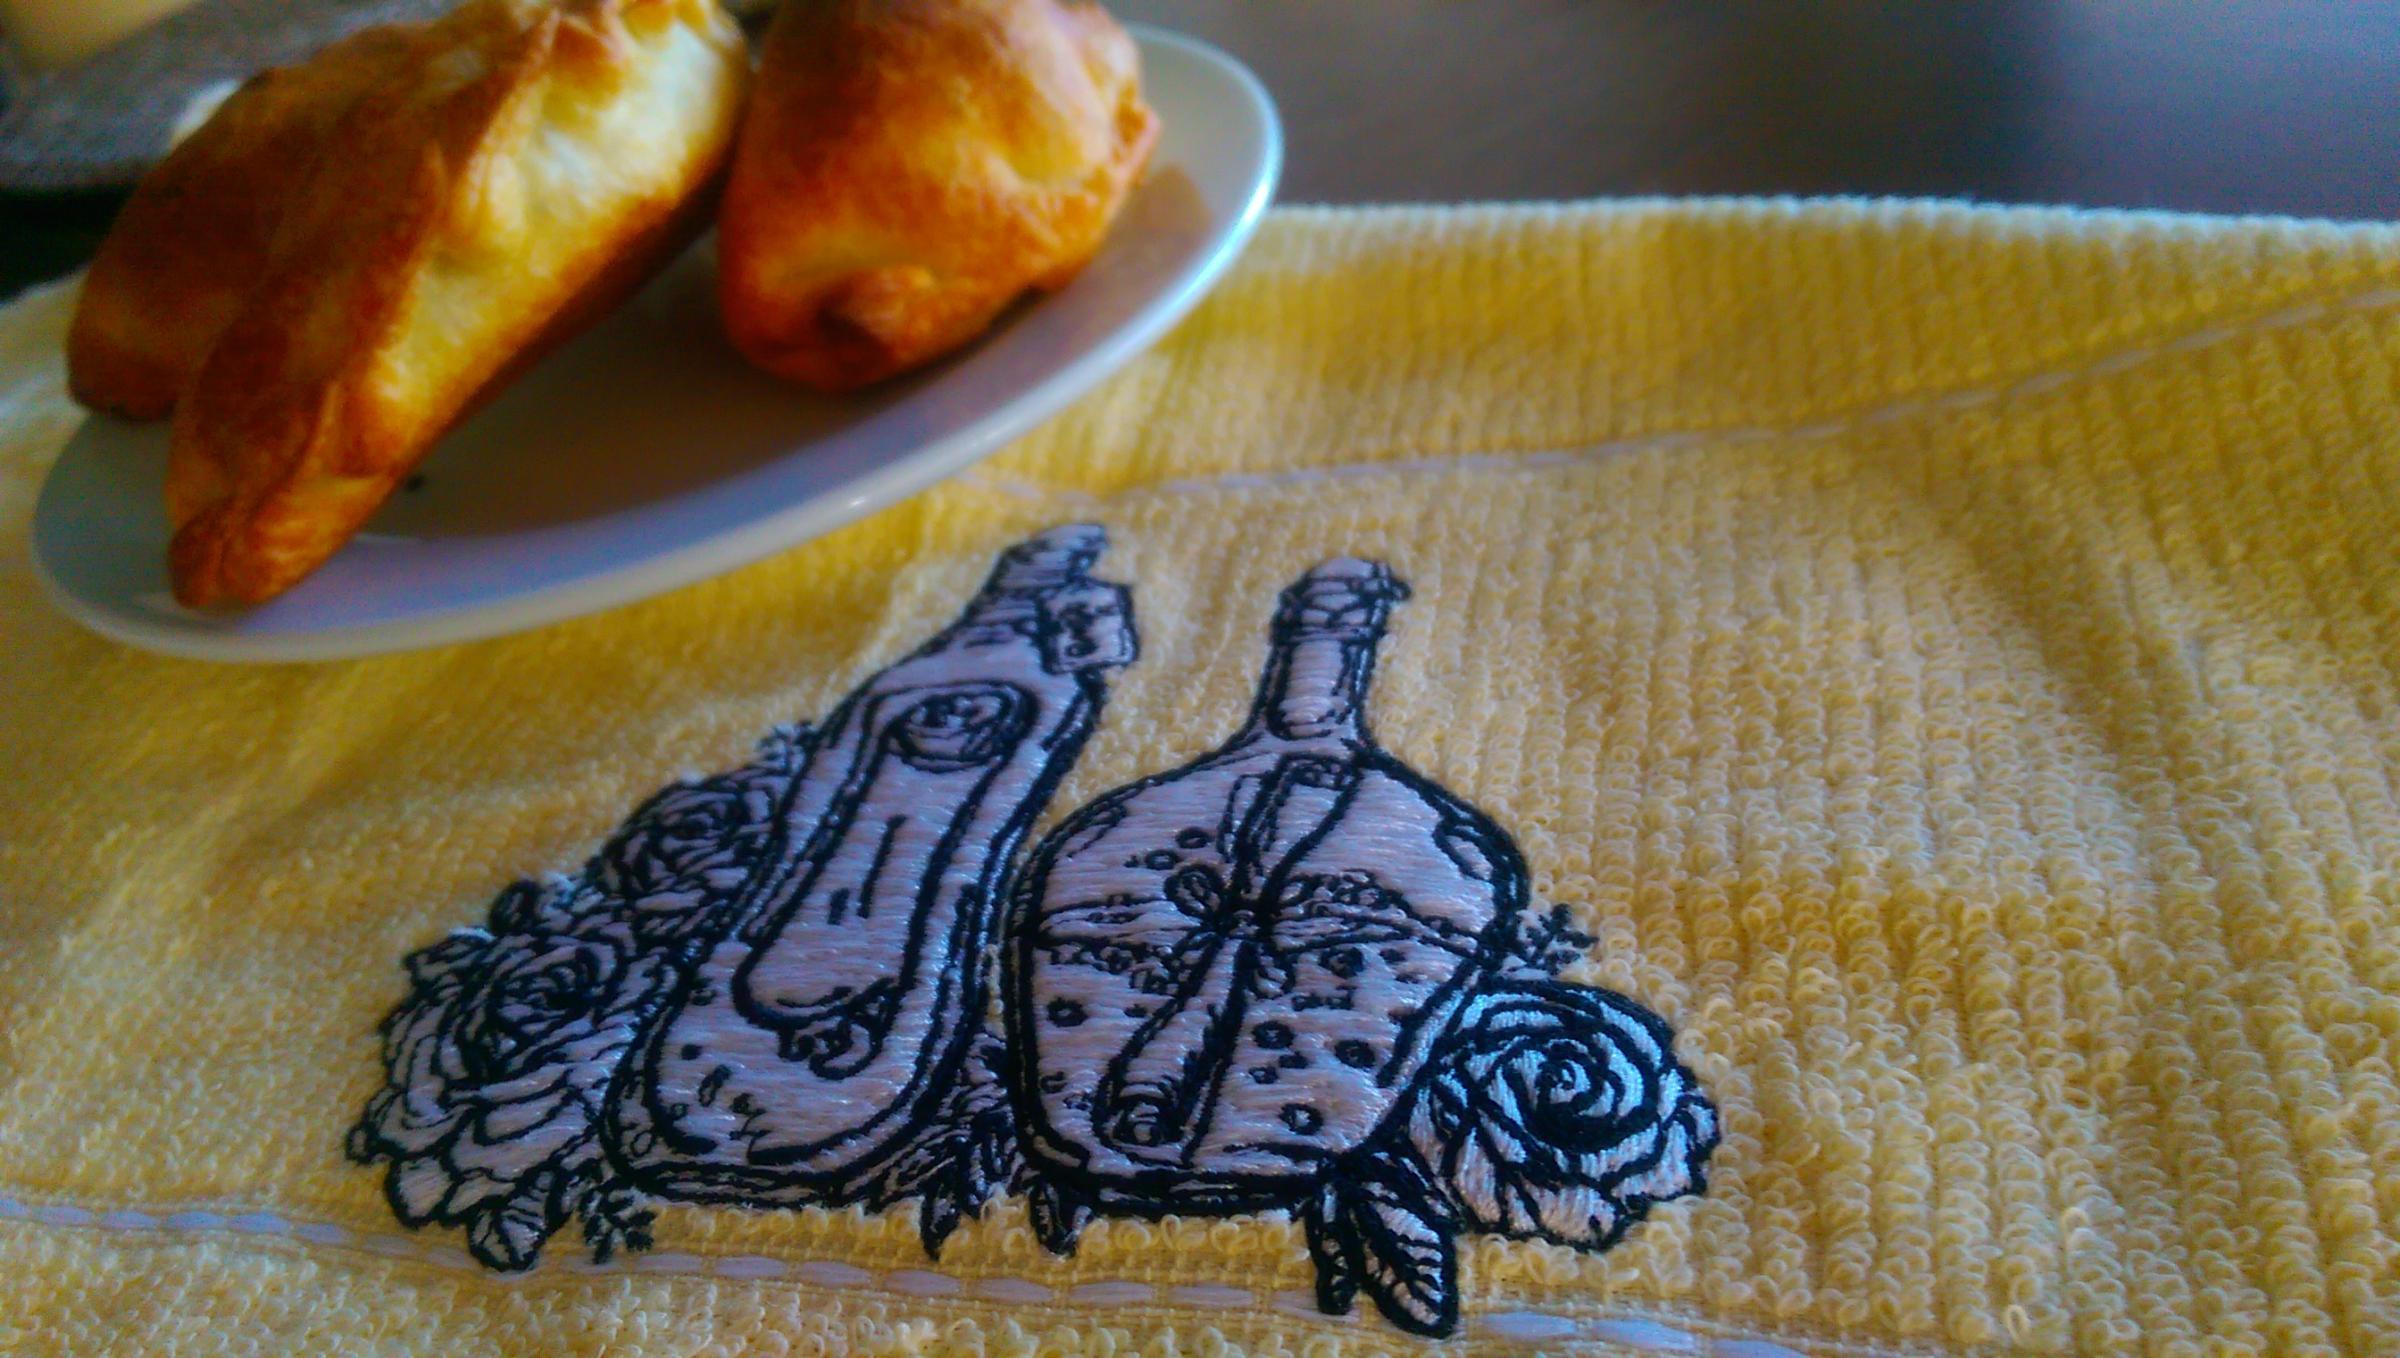 Embroidered kitchen napkin with Bottles design